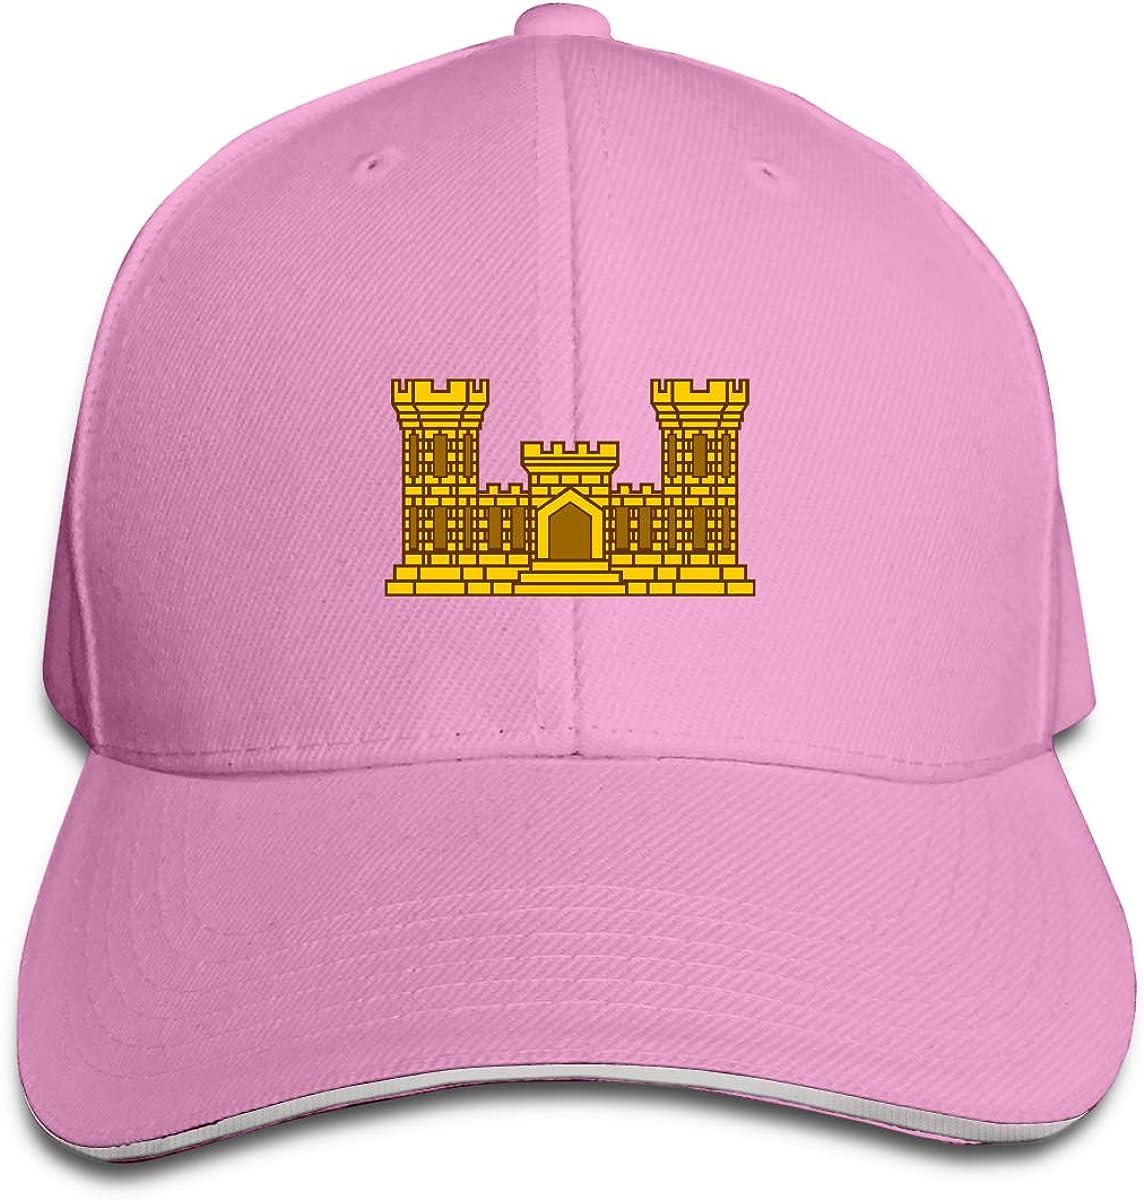 US Army Army Engineer Men and Women Adjustable Sandwich Peaked Baseball Cap